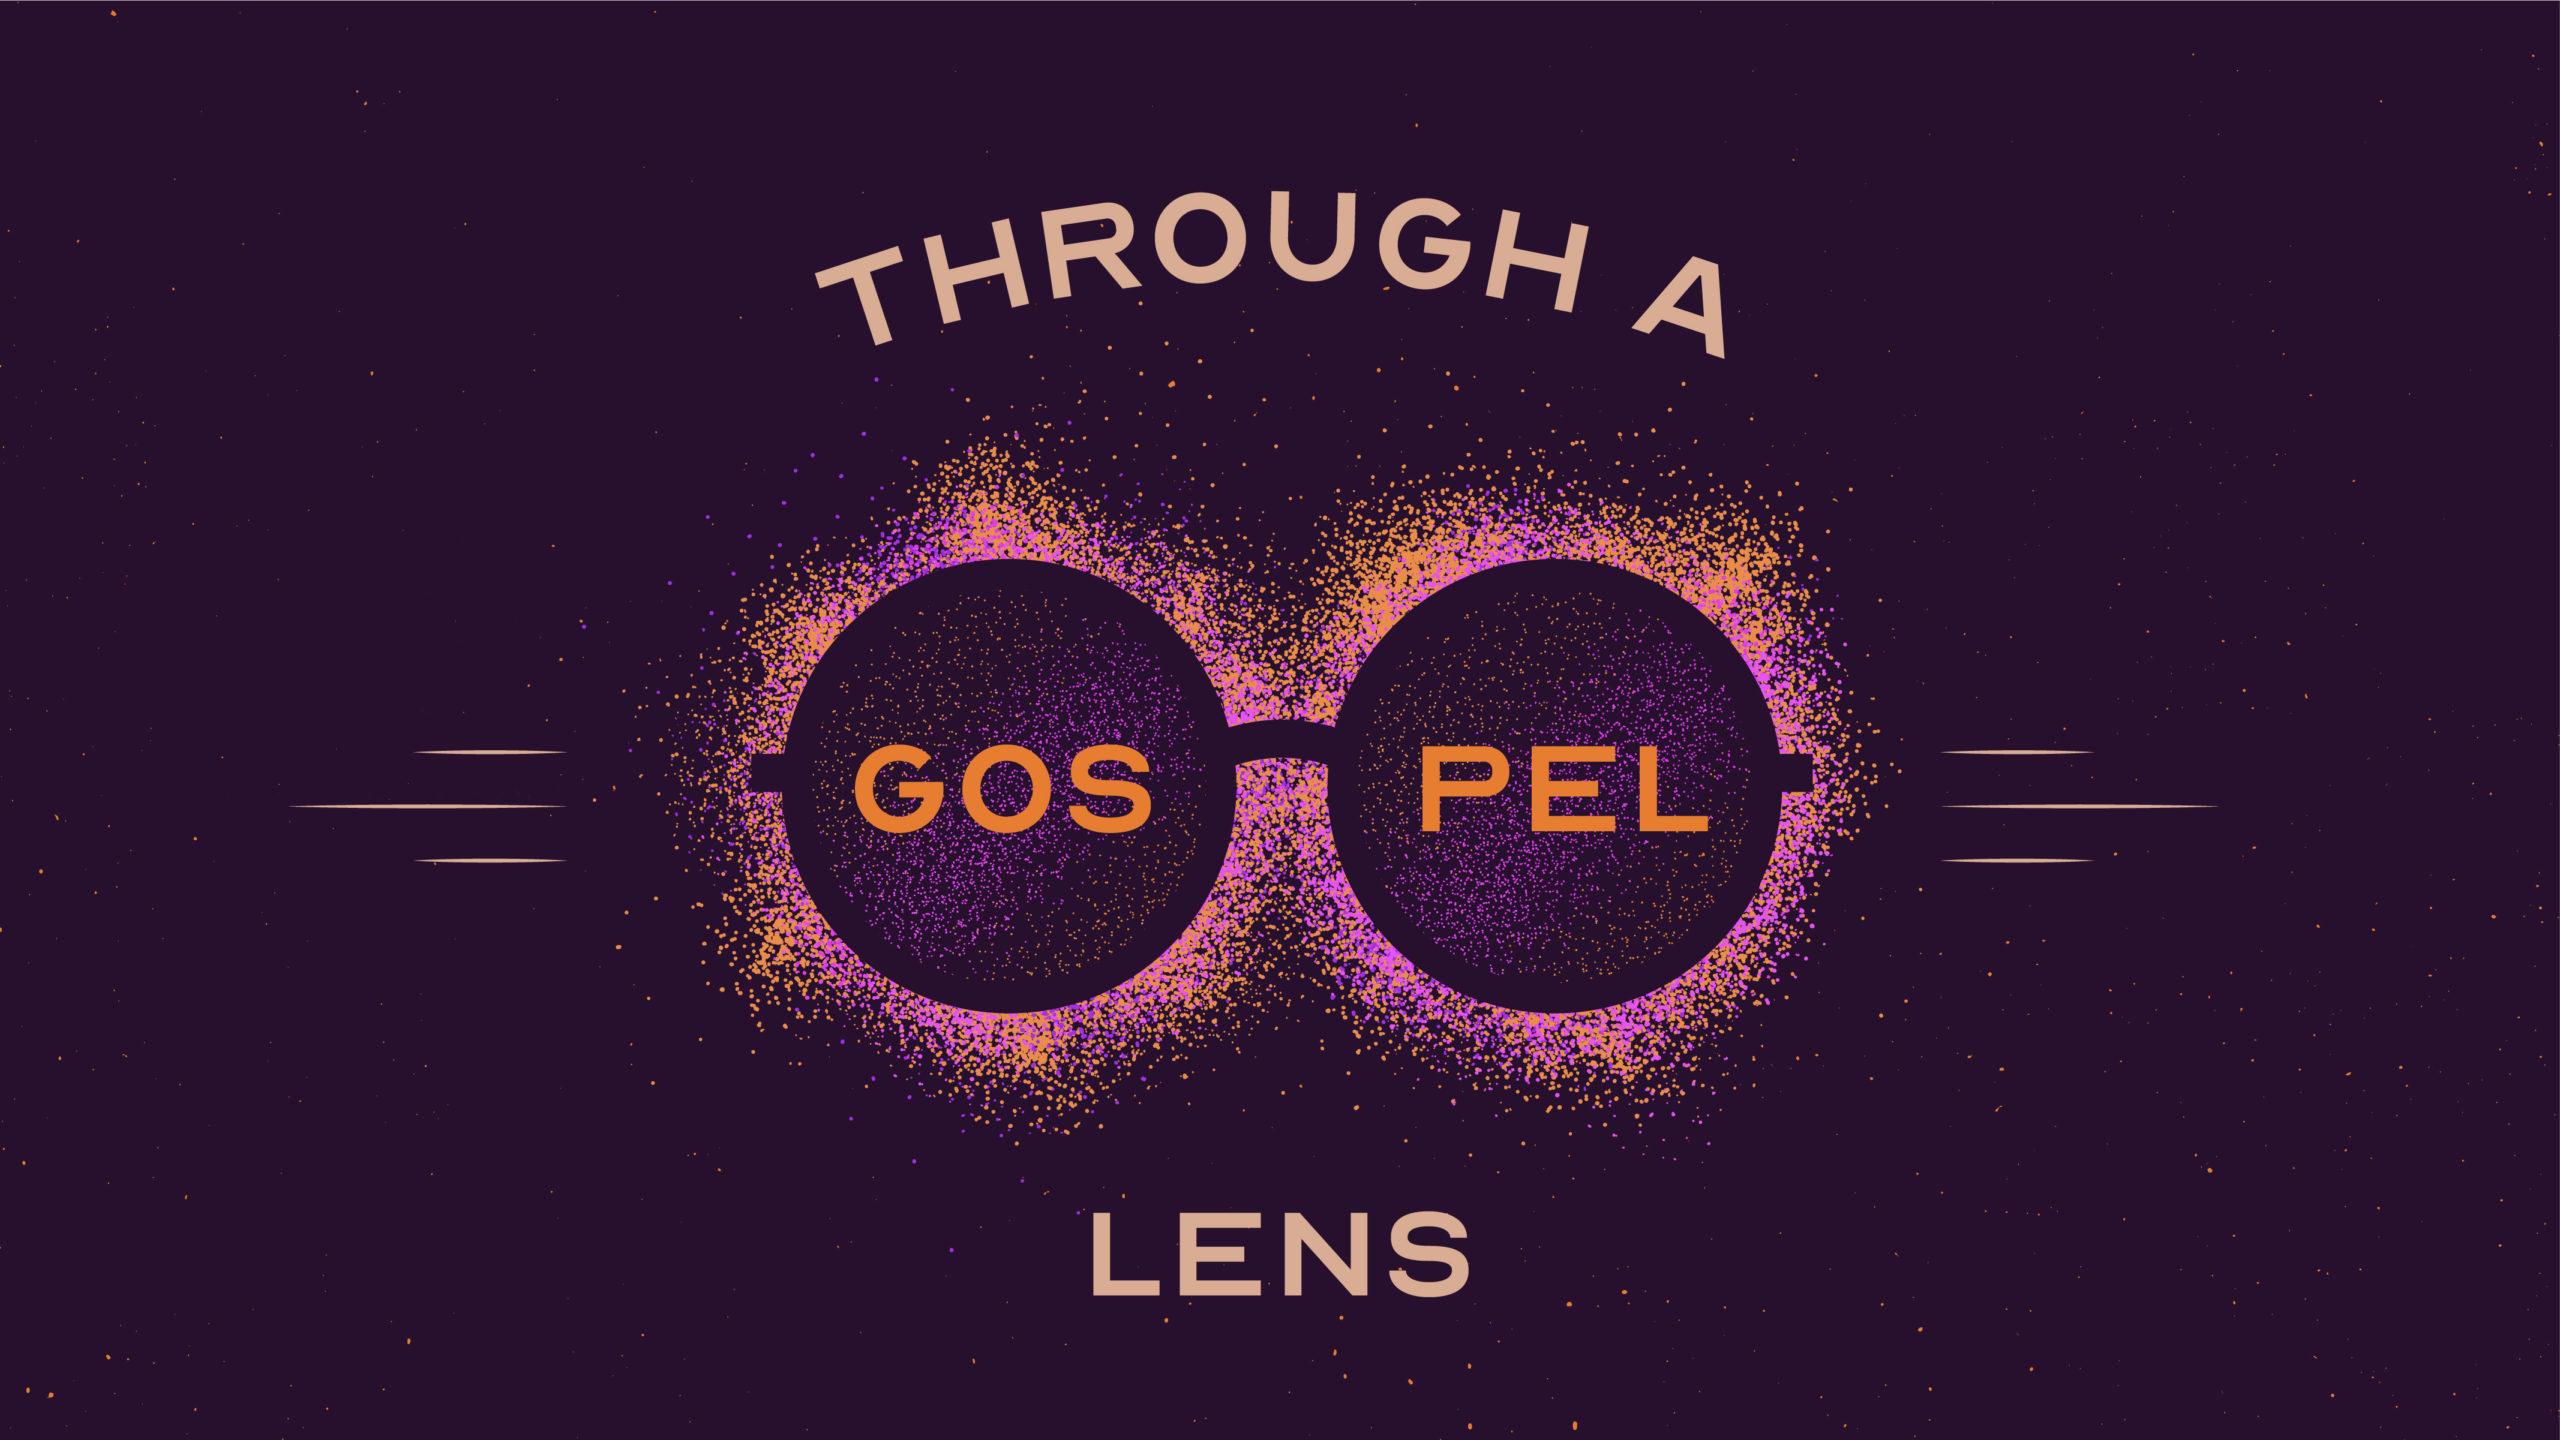 Through A Gospel Lens: We Are Loved